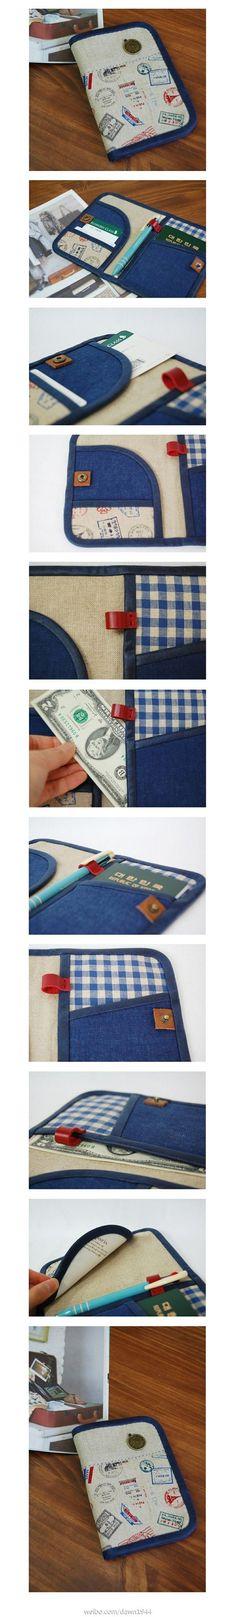 Travel Wallet Tutorial  韩网搜到的护照证件夹,非常精致,喜欢的同学可以参考了~~